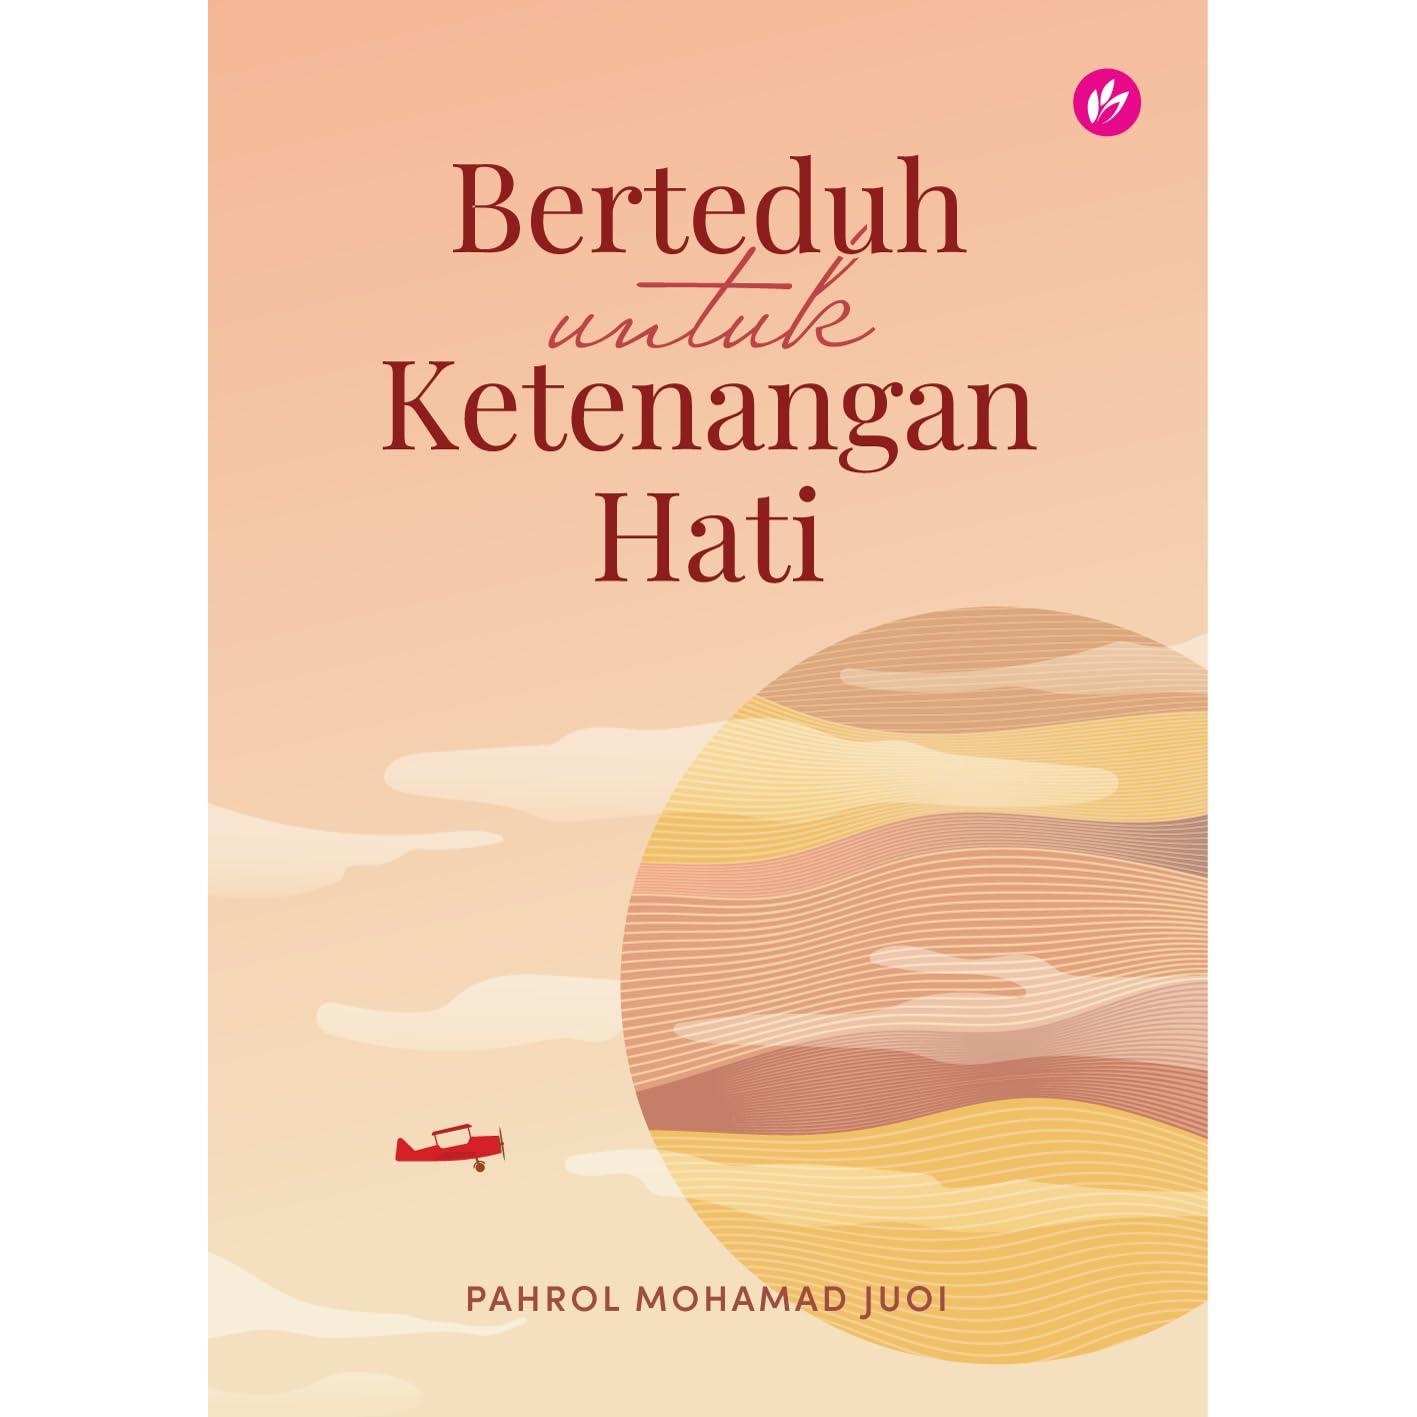 Berteduh Untuk Ketenangan Hati by Pahrol Mohamad Juoi